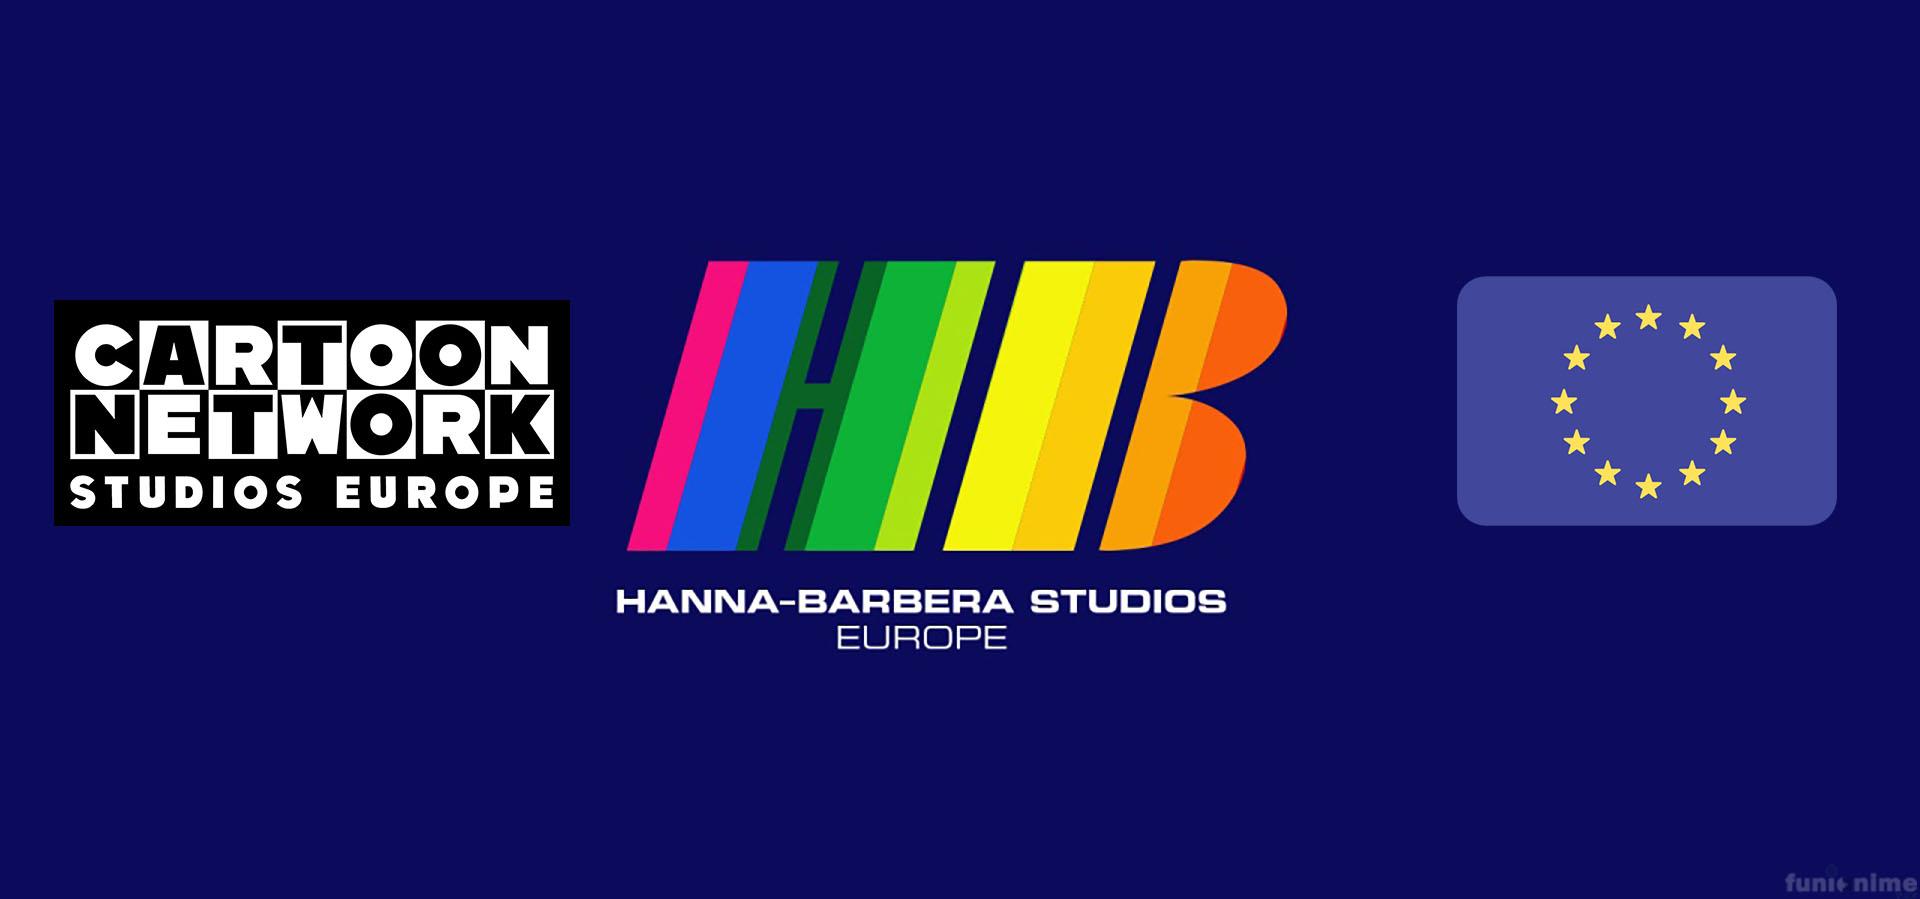 ¡Hanna-Barbera vuelve! Cartoon Network Studios Europe cambia de nombre